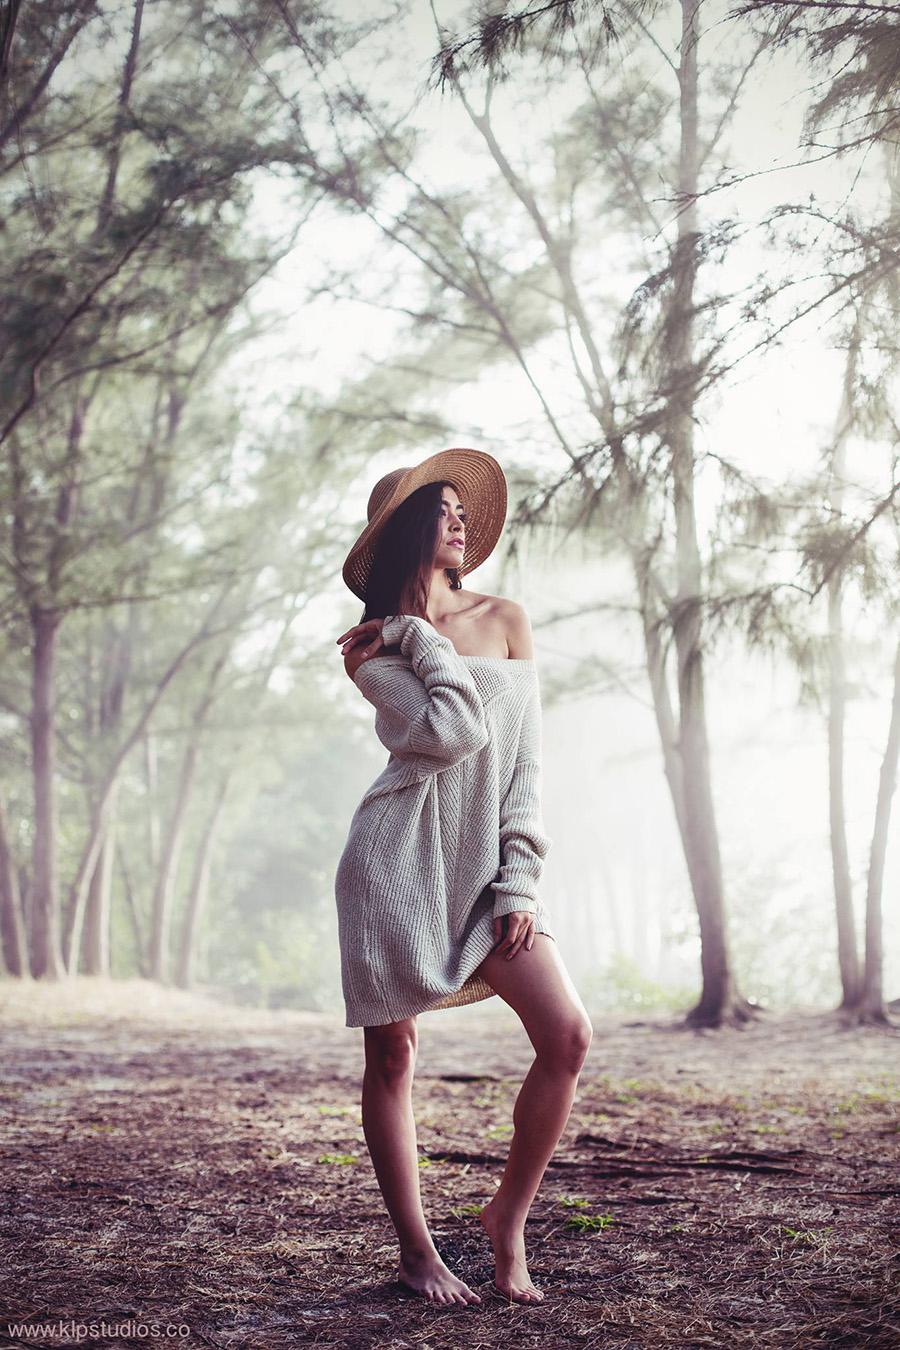 Krista LaJara Photography - PS Action   Daisy